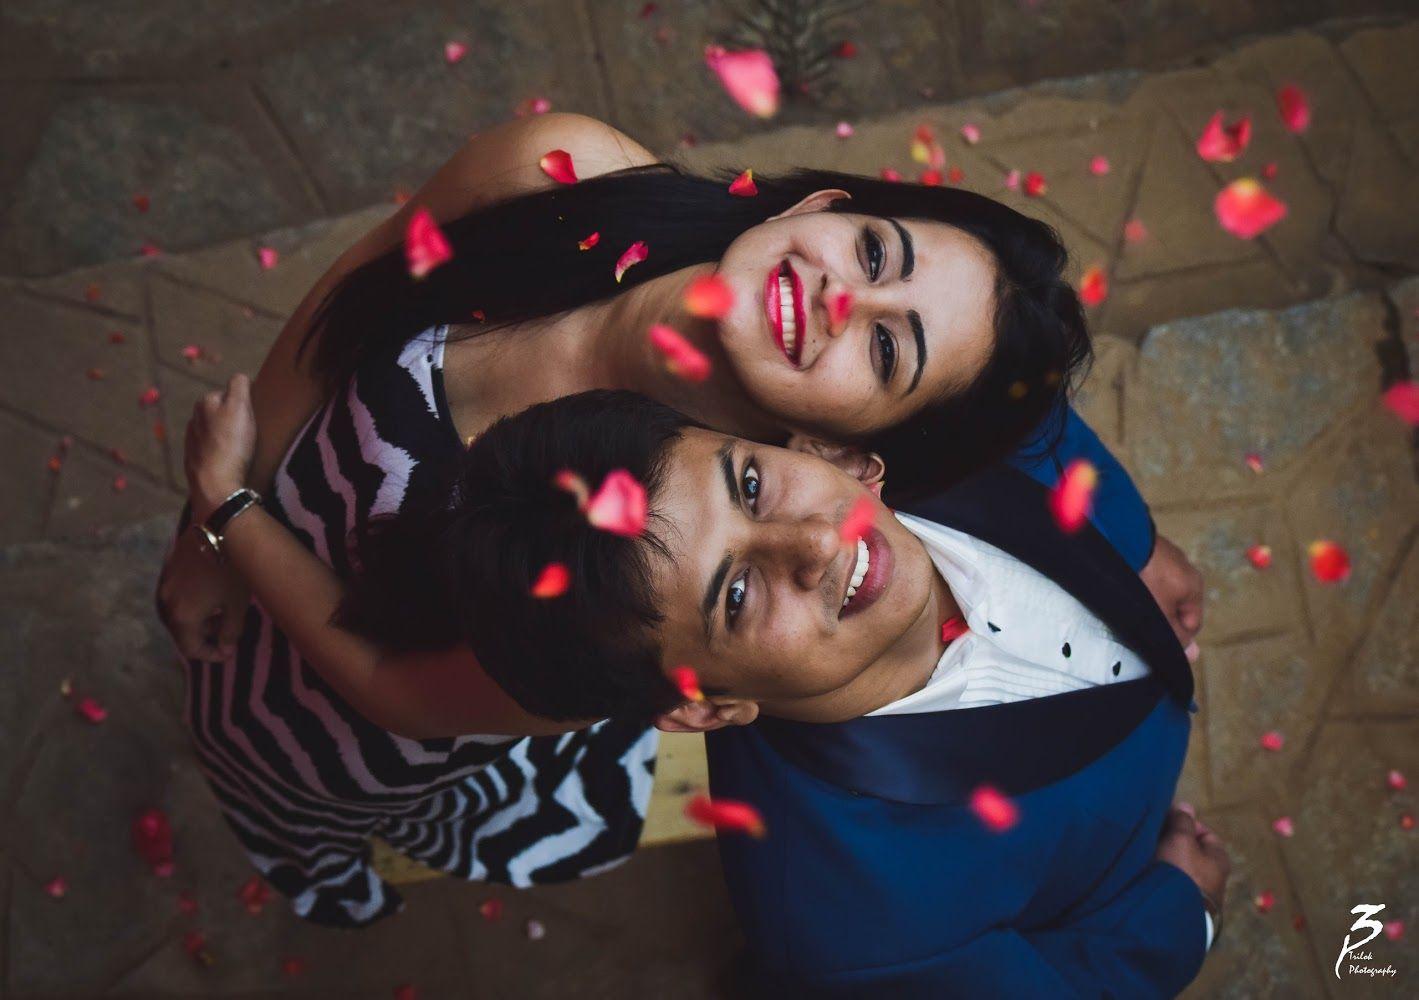 Wedding Photography Wedding Photoshoot Poses Pre Wedding Photoshoot Outdoor Indian Wedding Photography